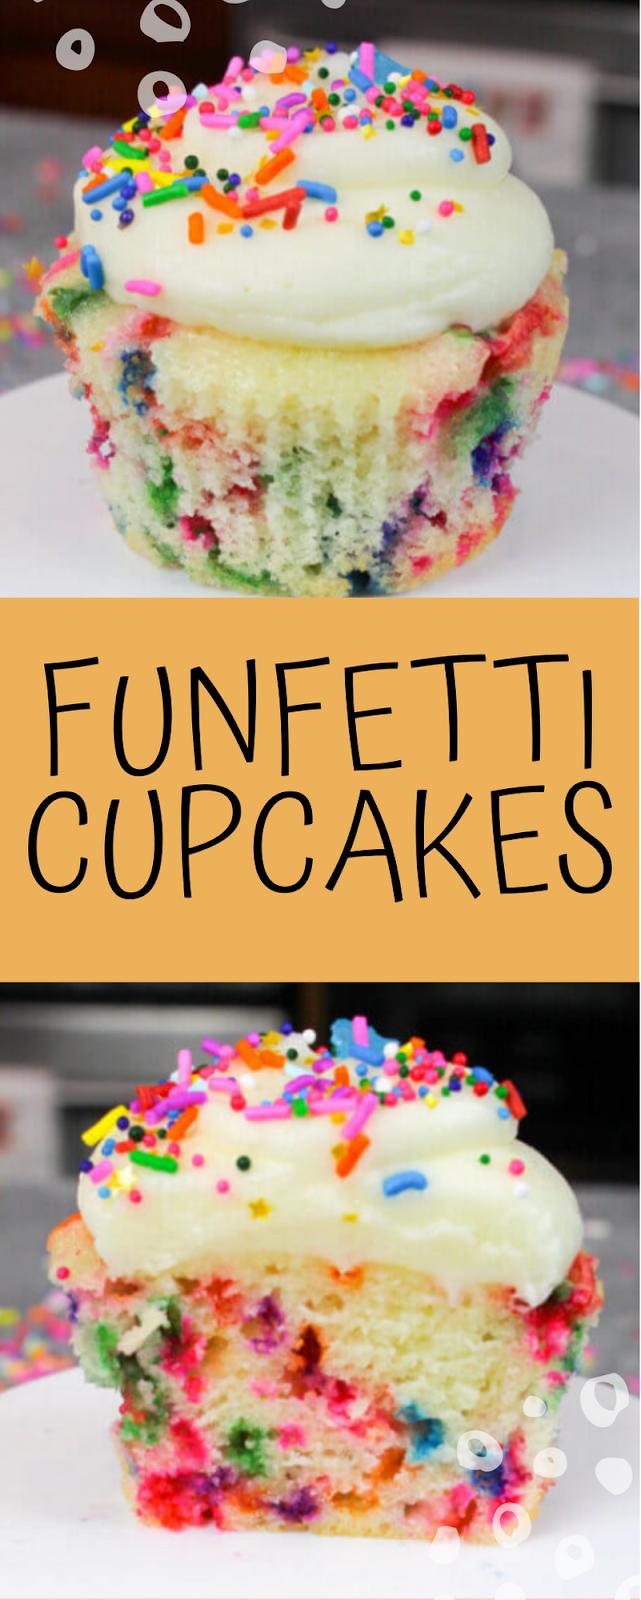 Funfetti Cupcakes Aurorafoods Funfetti Cupcakes Cupcake Recipes Fun Cupcake Recipes